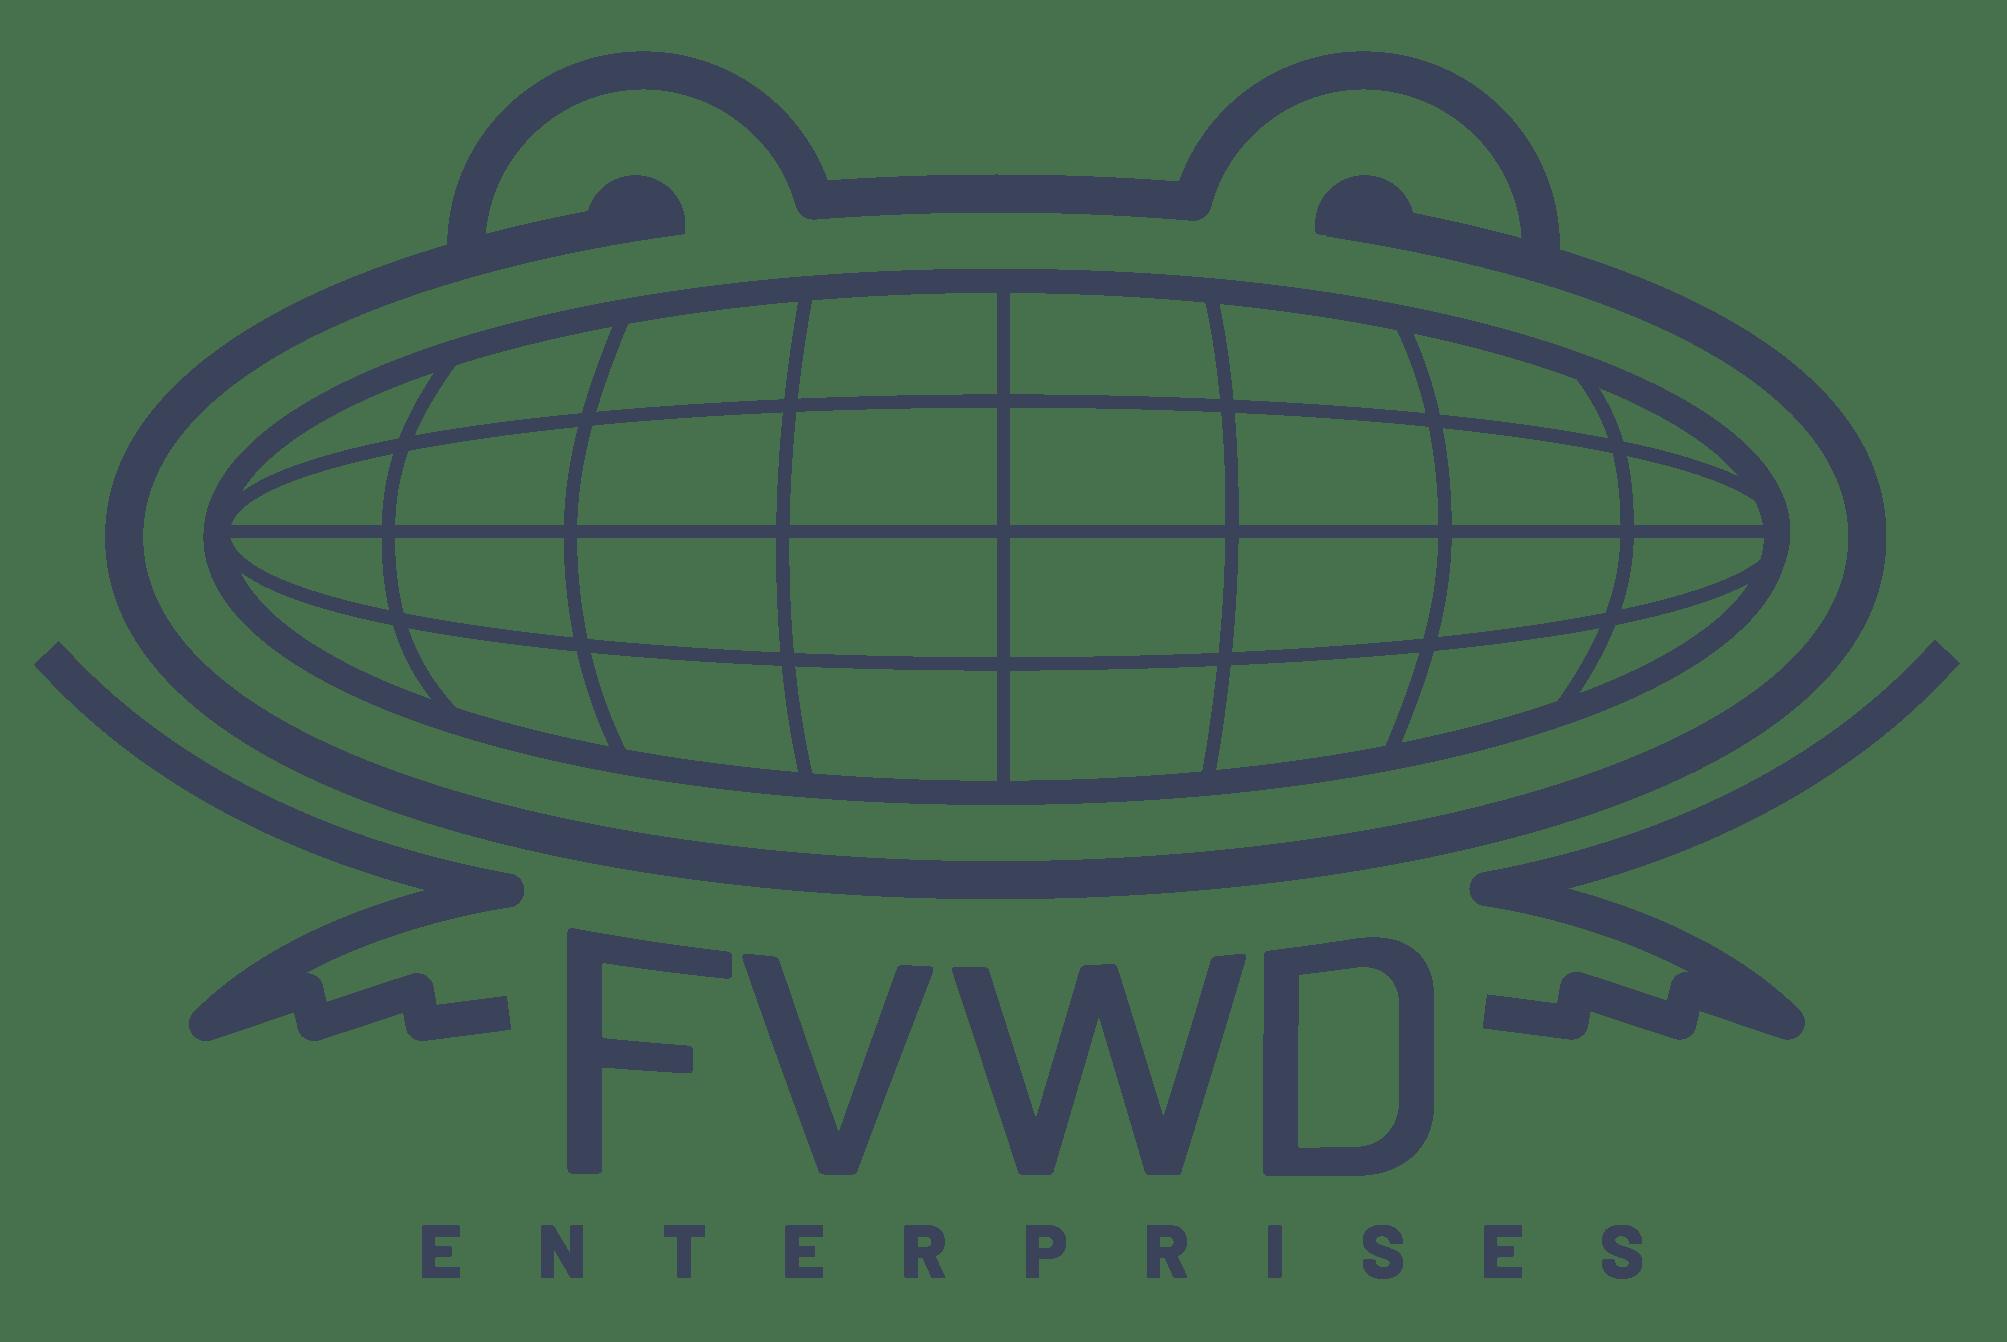 Website SEO Canada - FVWD Enterprises